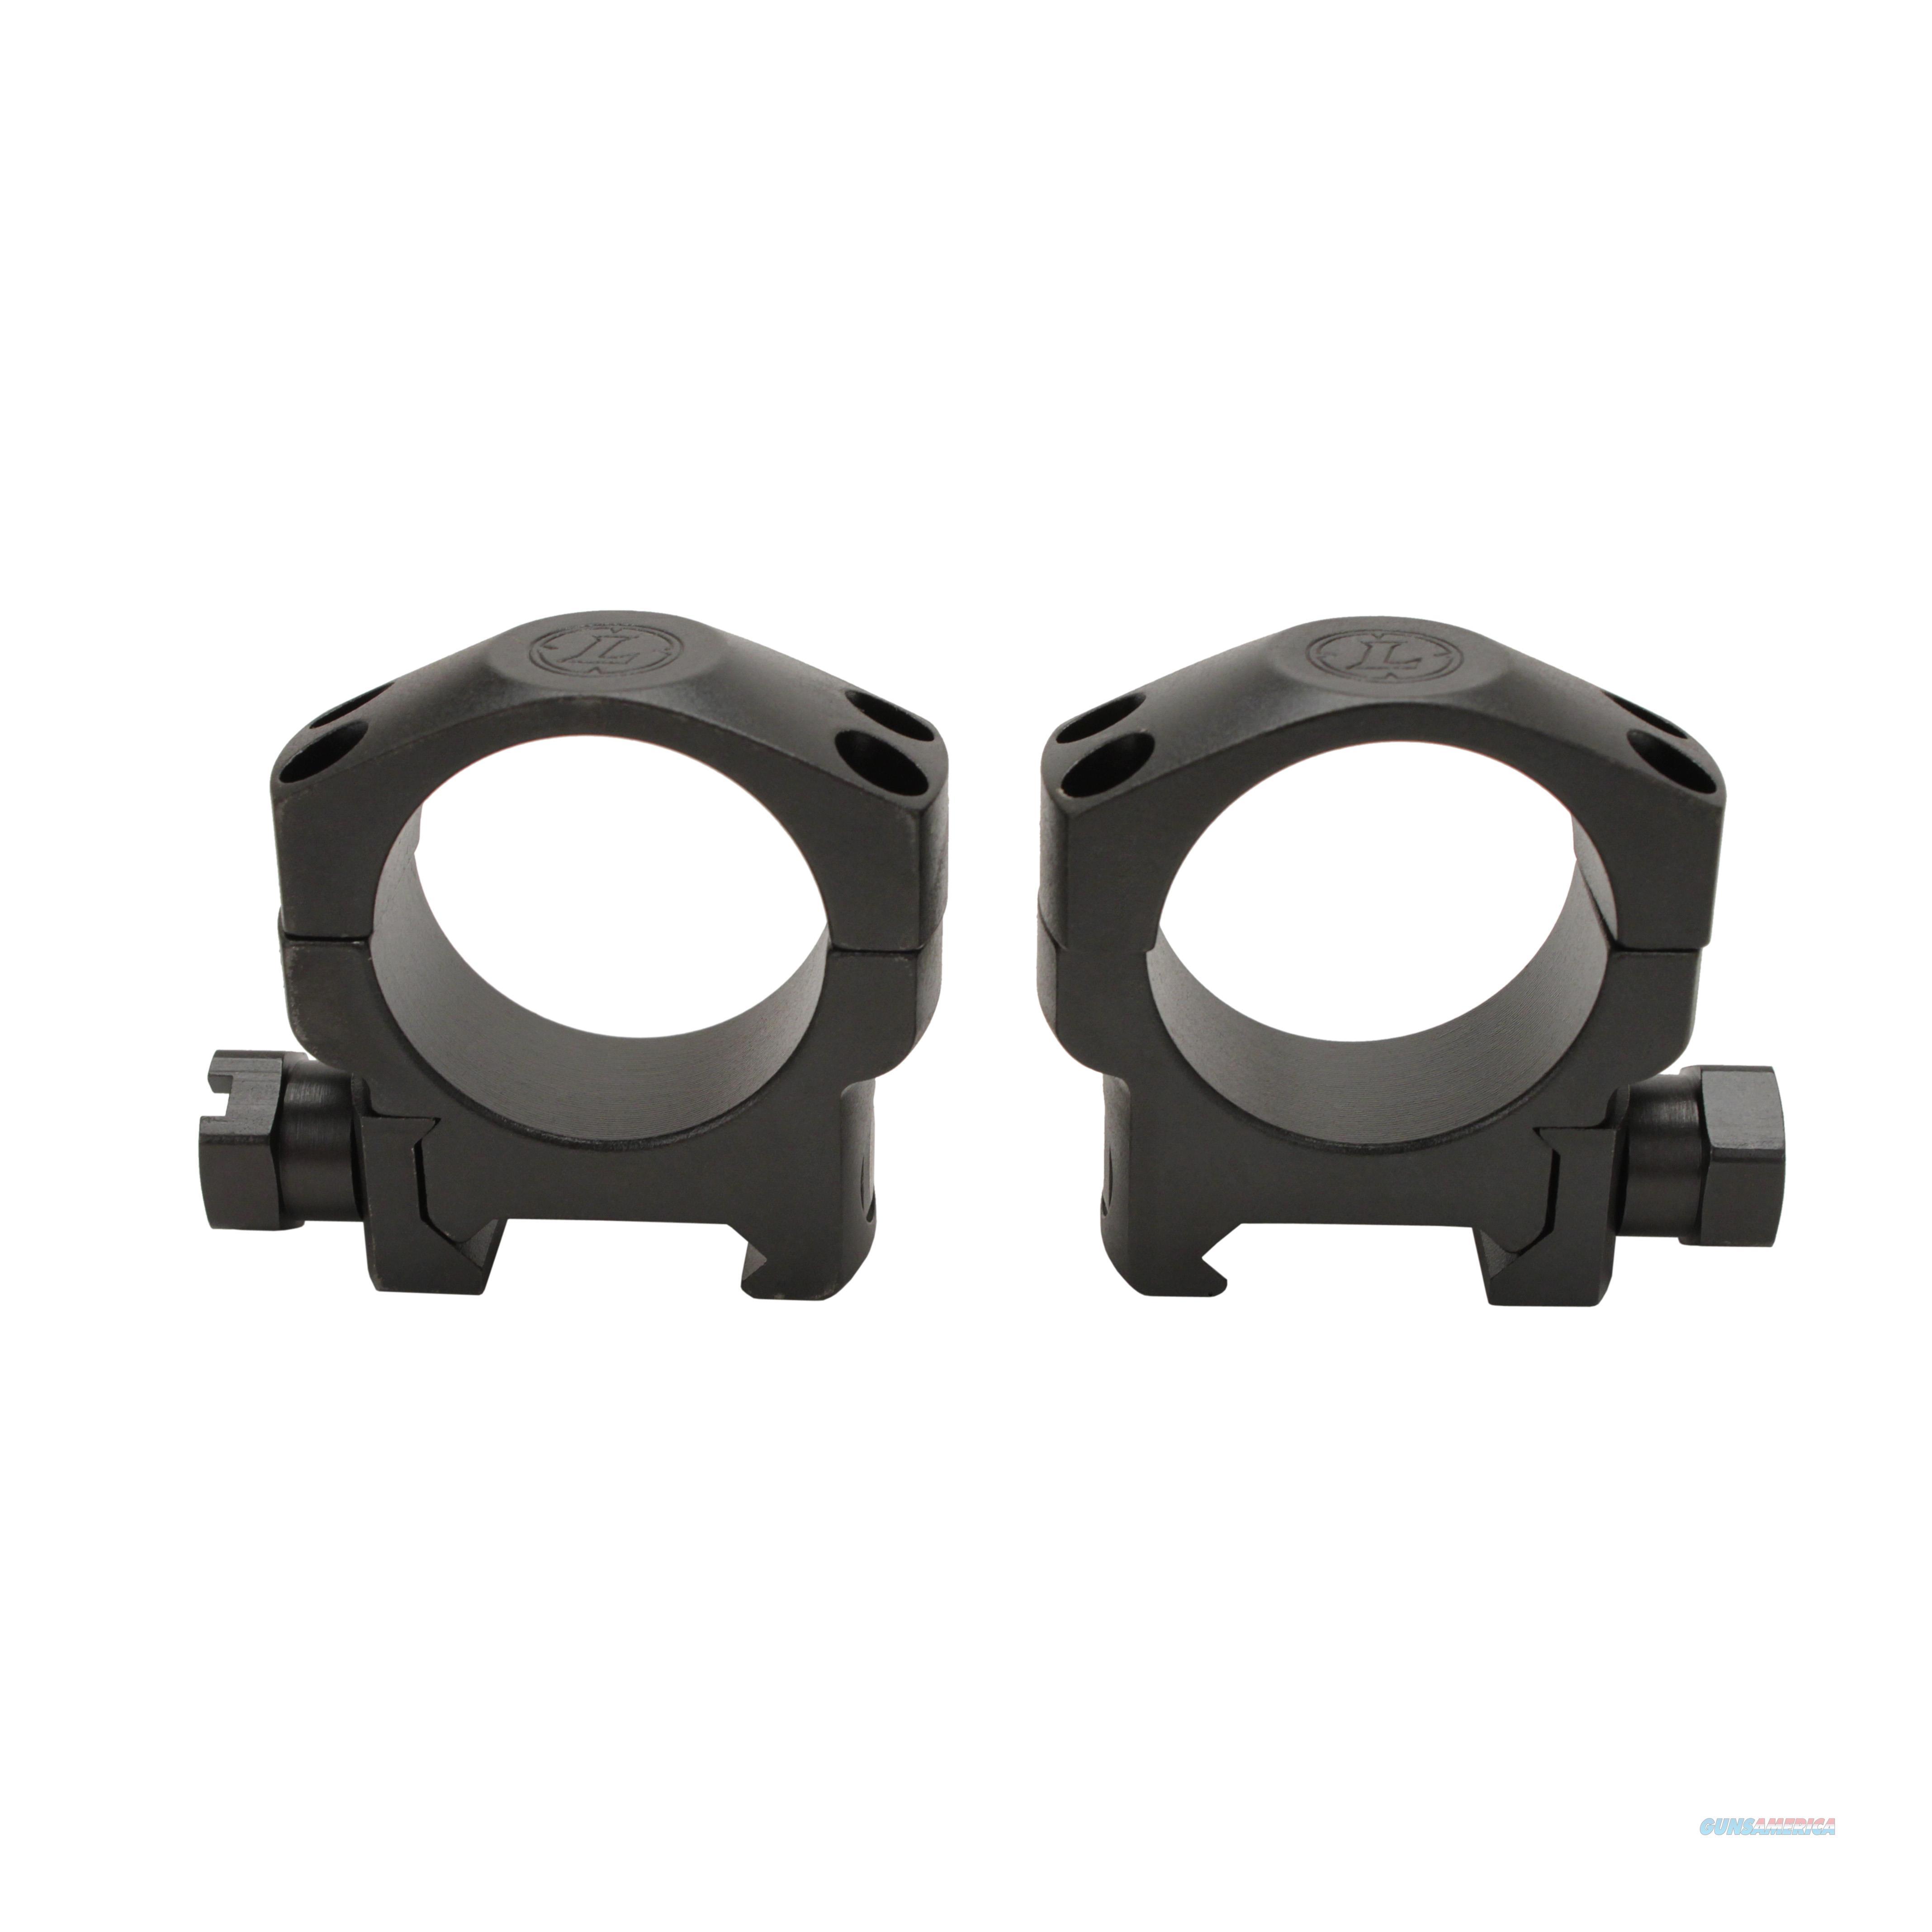 Leupold Mark 4 30Mm Med Matte 61049  Non-Guns > Scopes/Mounts/Rings & Optics > Mounts > Other